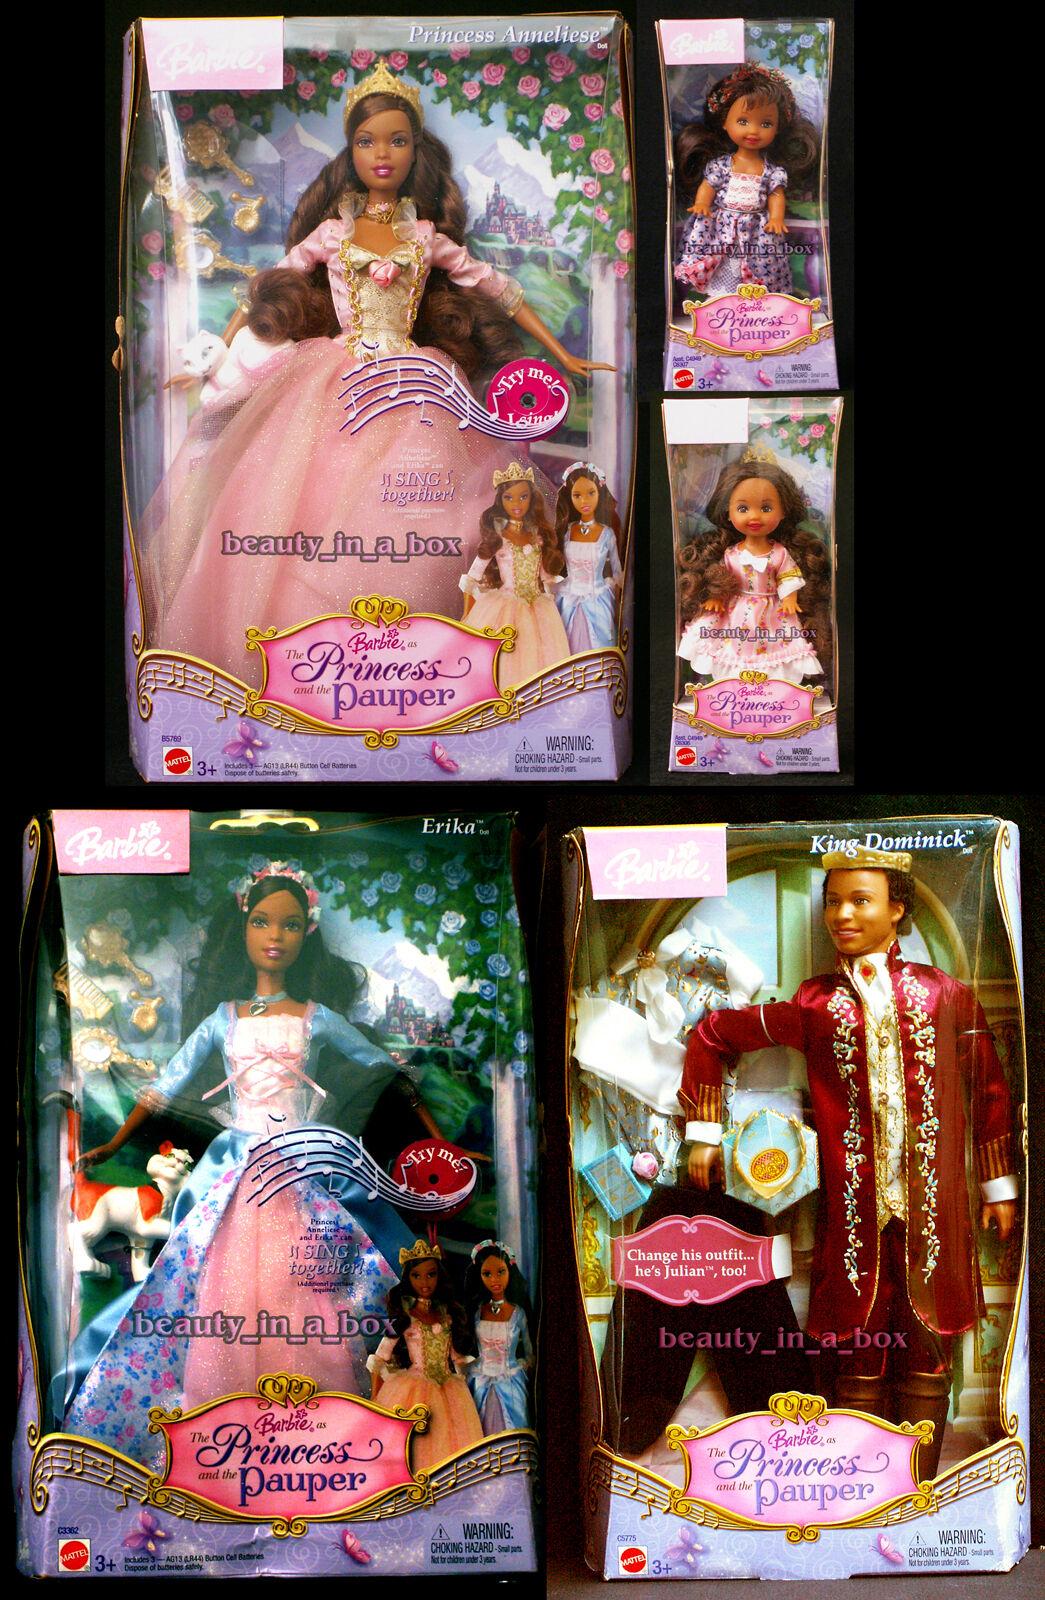 Muñeca Barbie Kritsaralam Erika Dominick African American PRINCESS PAUPER AA  Lote 5